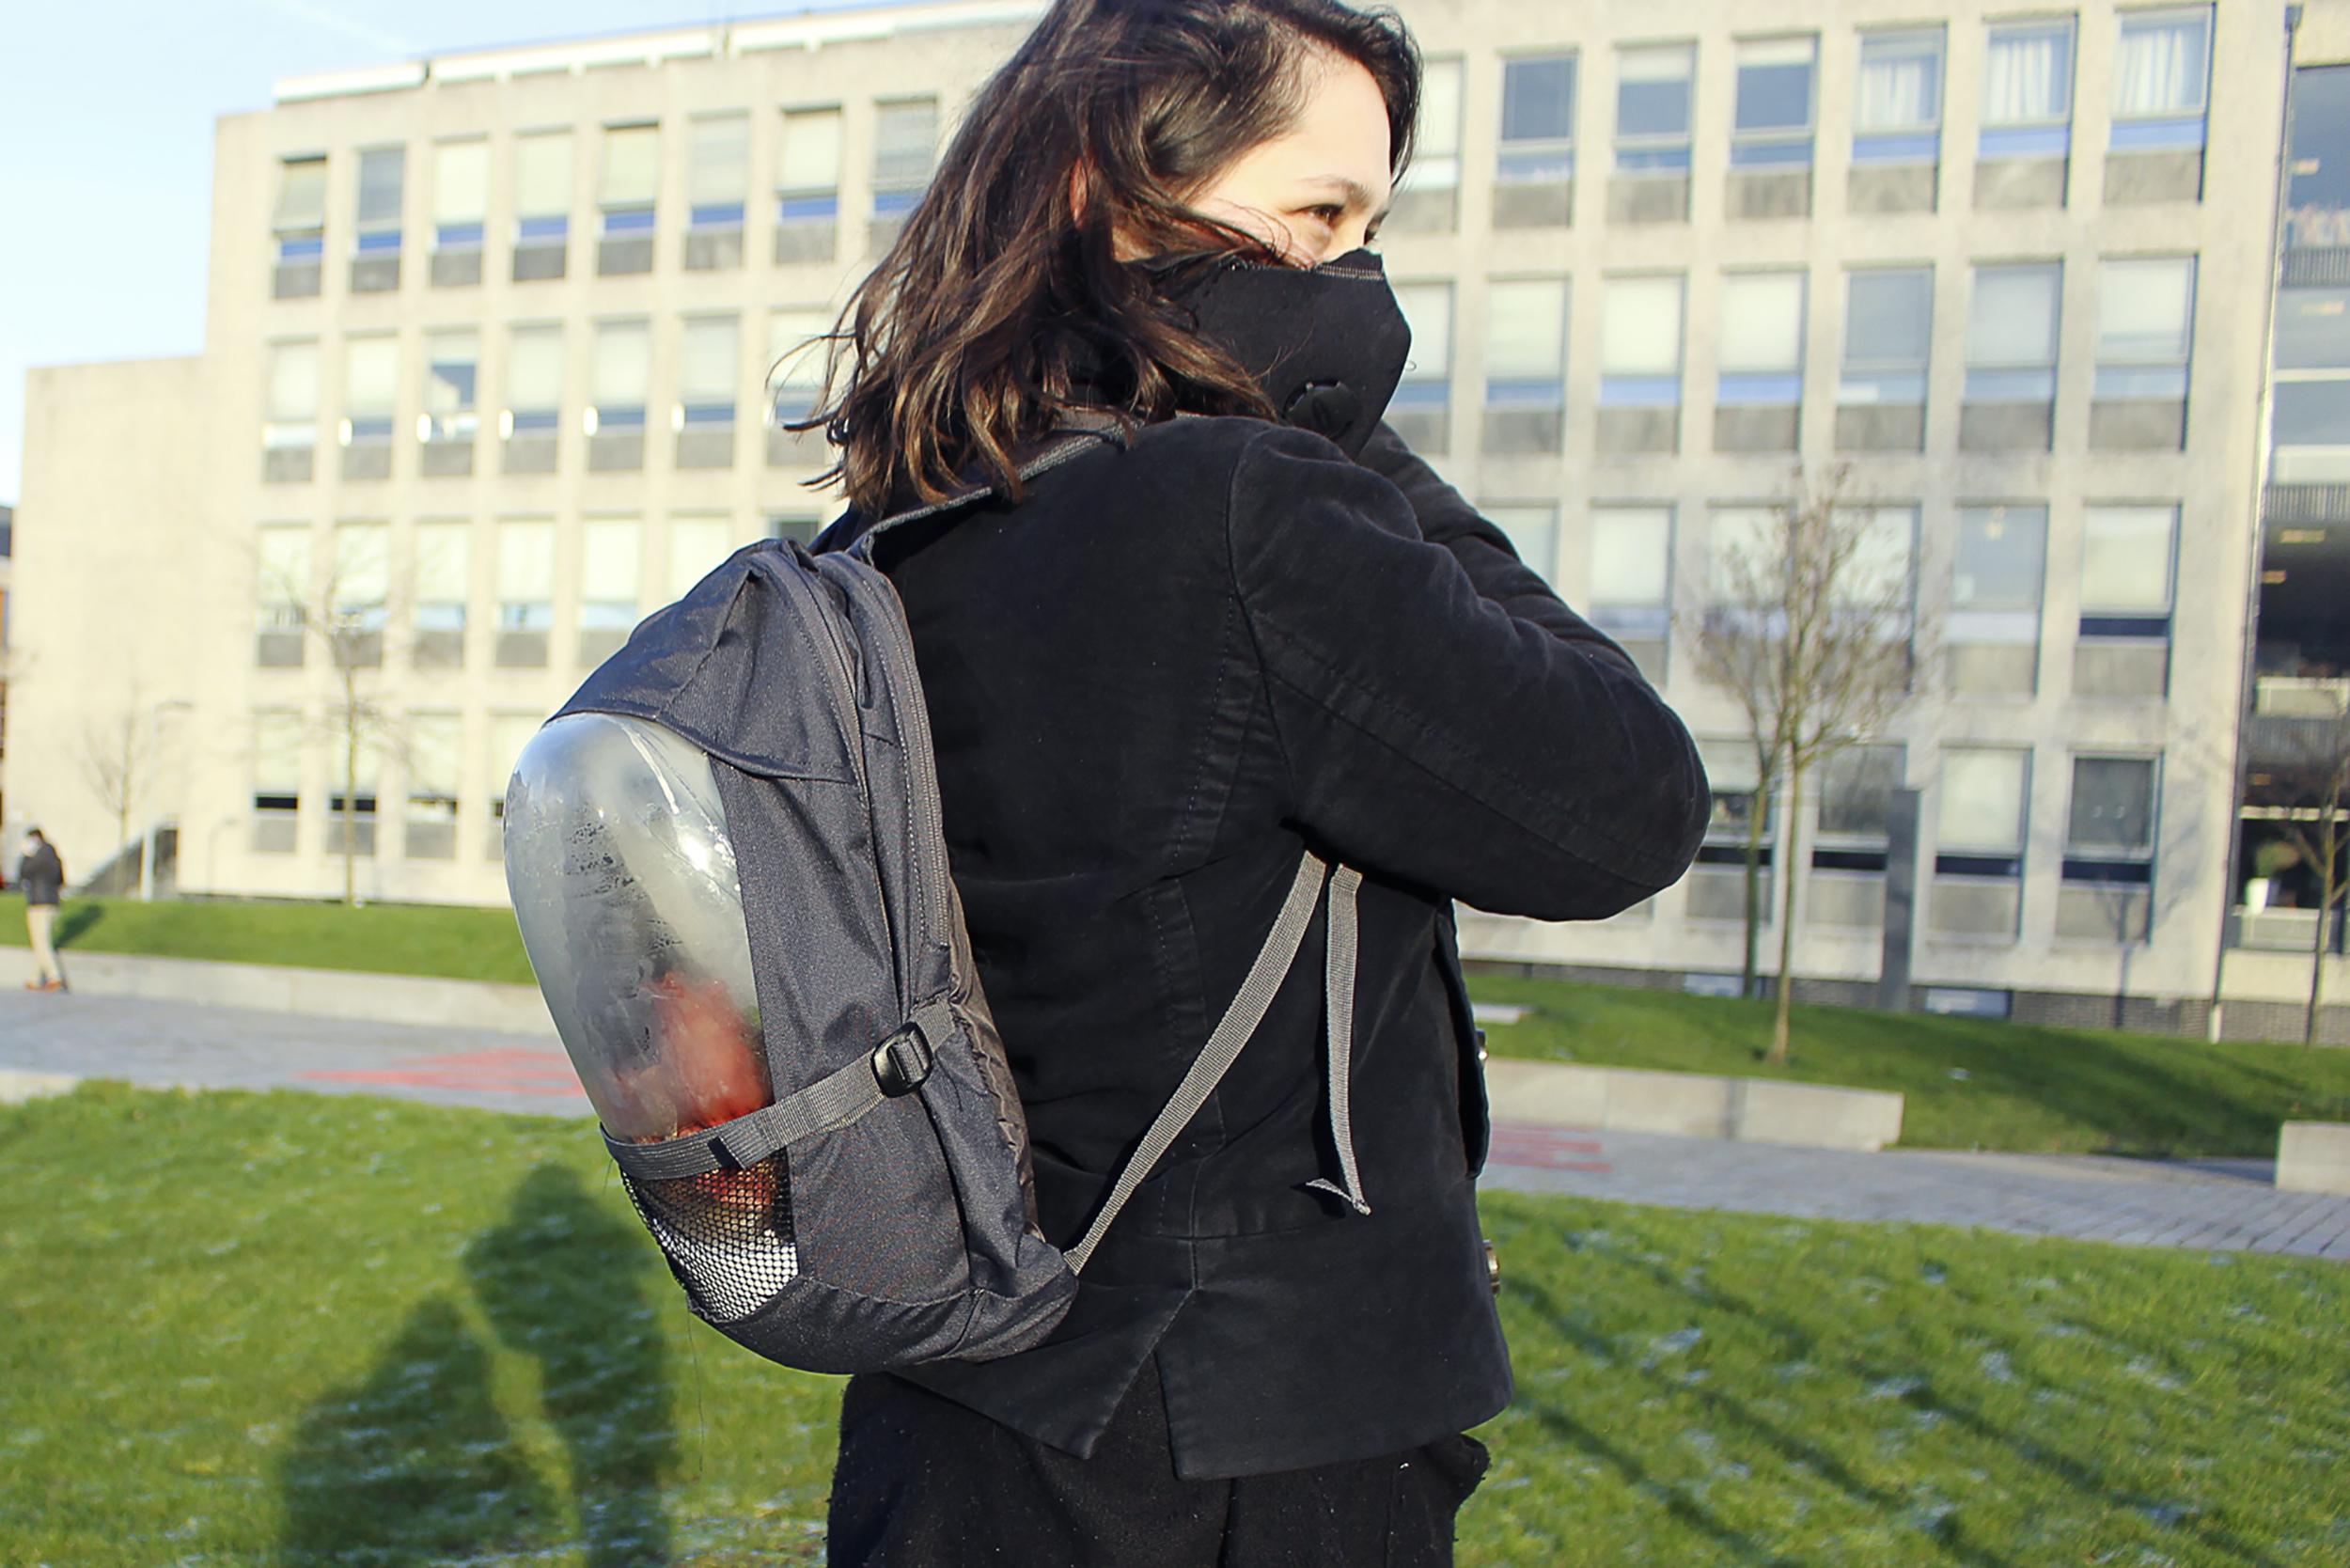 « The Plant Bag », le sac anti-pollution